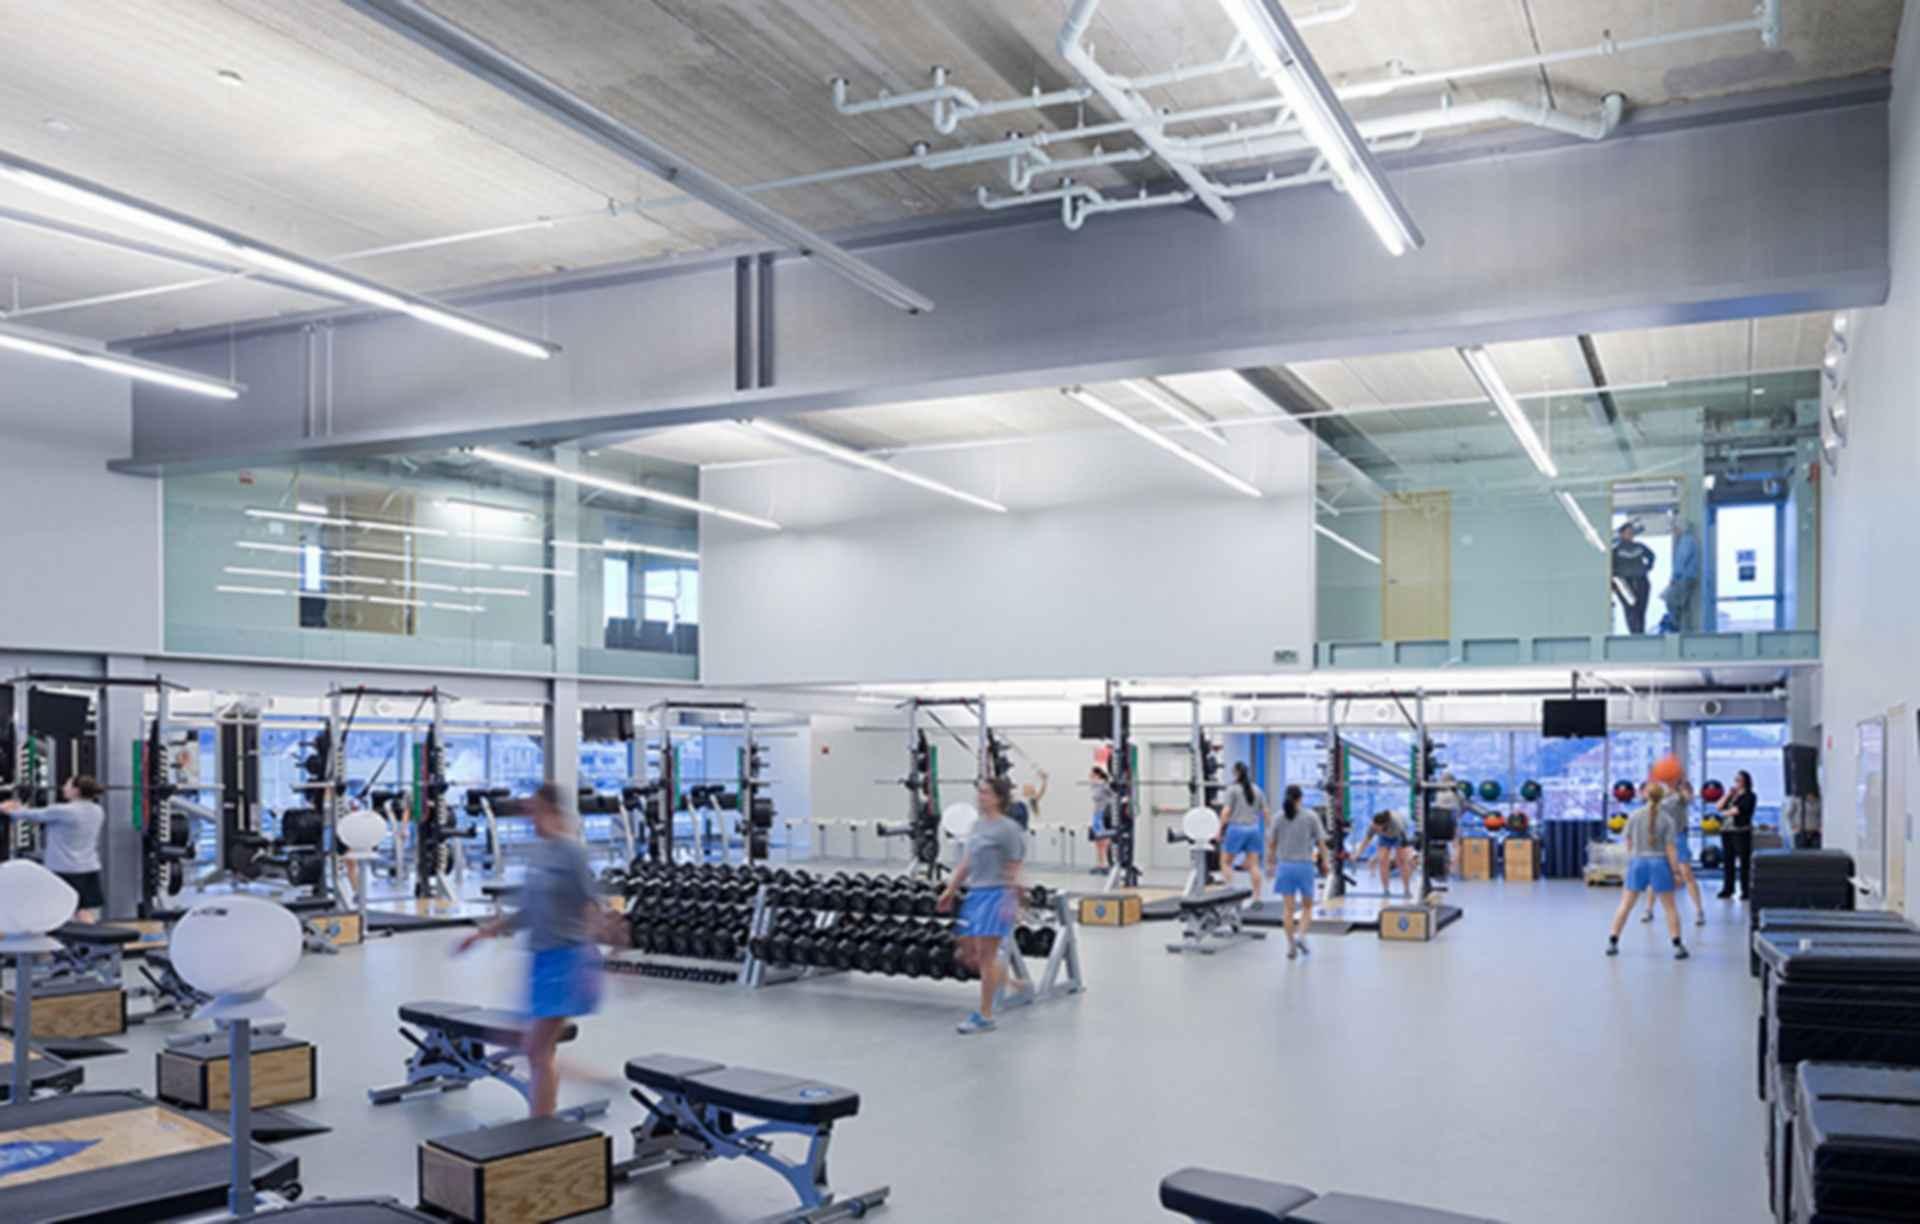 Campbell Sports Center - Interior/Gym